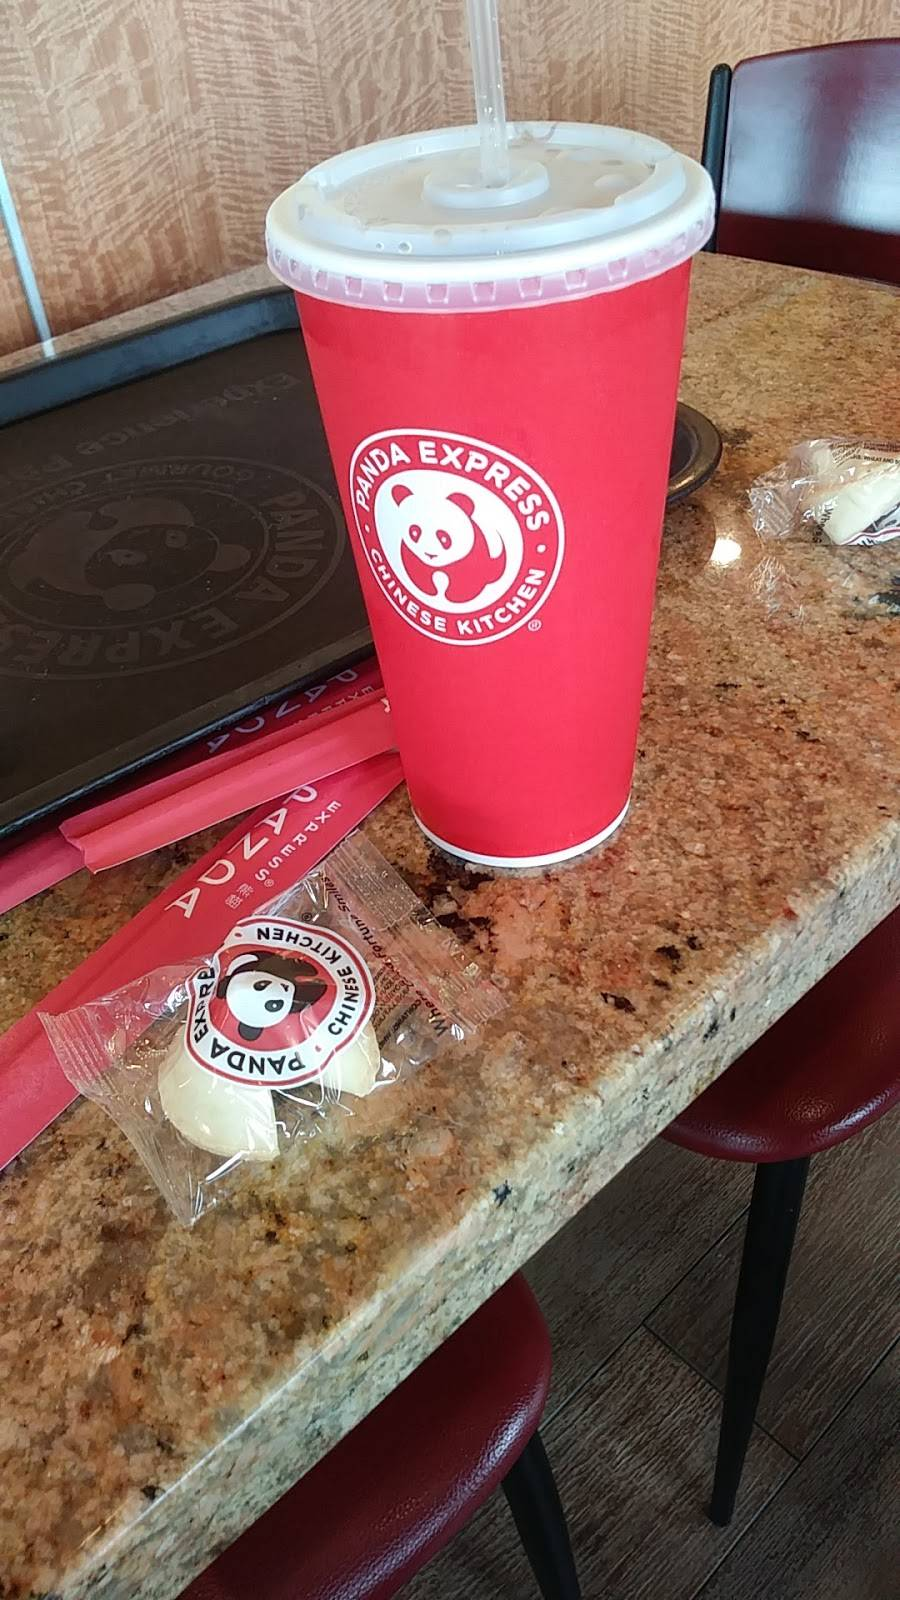 Panda Express | meal takeaway | 13340 Rittenhouse Dr, Midlothian, VA 23112, USA | 8047633227 OR +1 804-763-3227